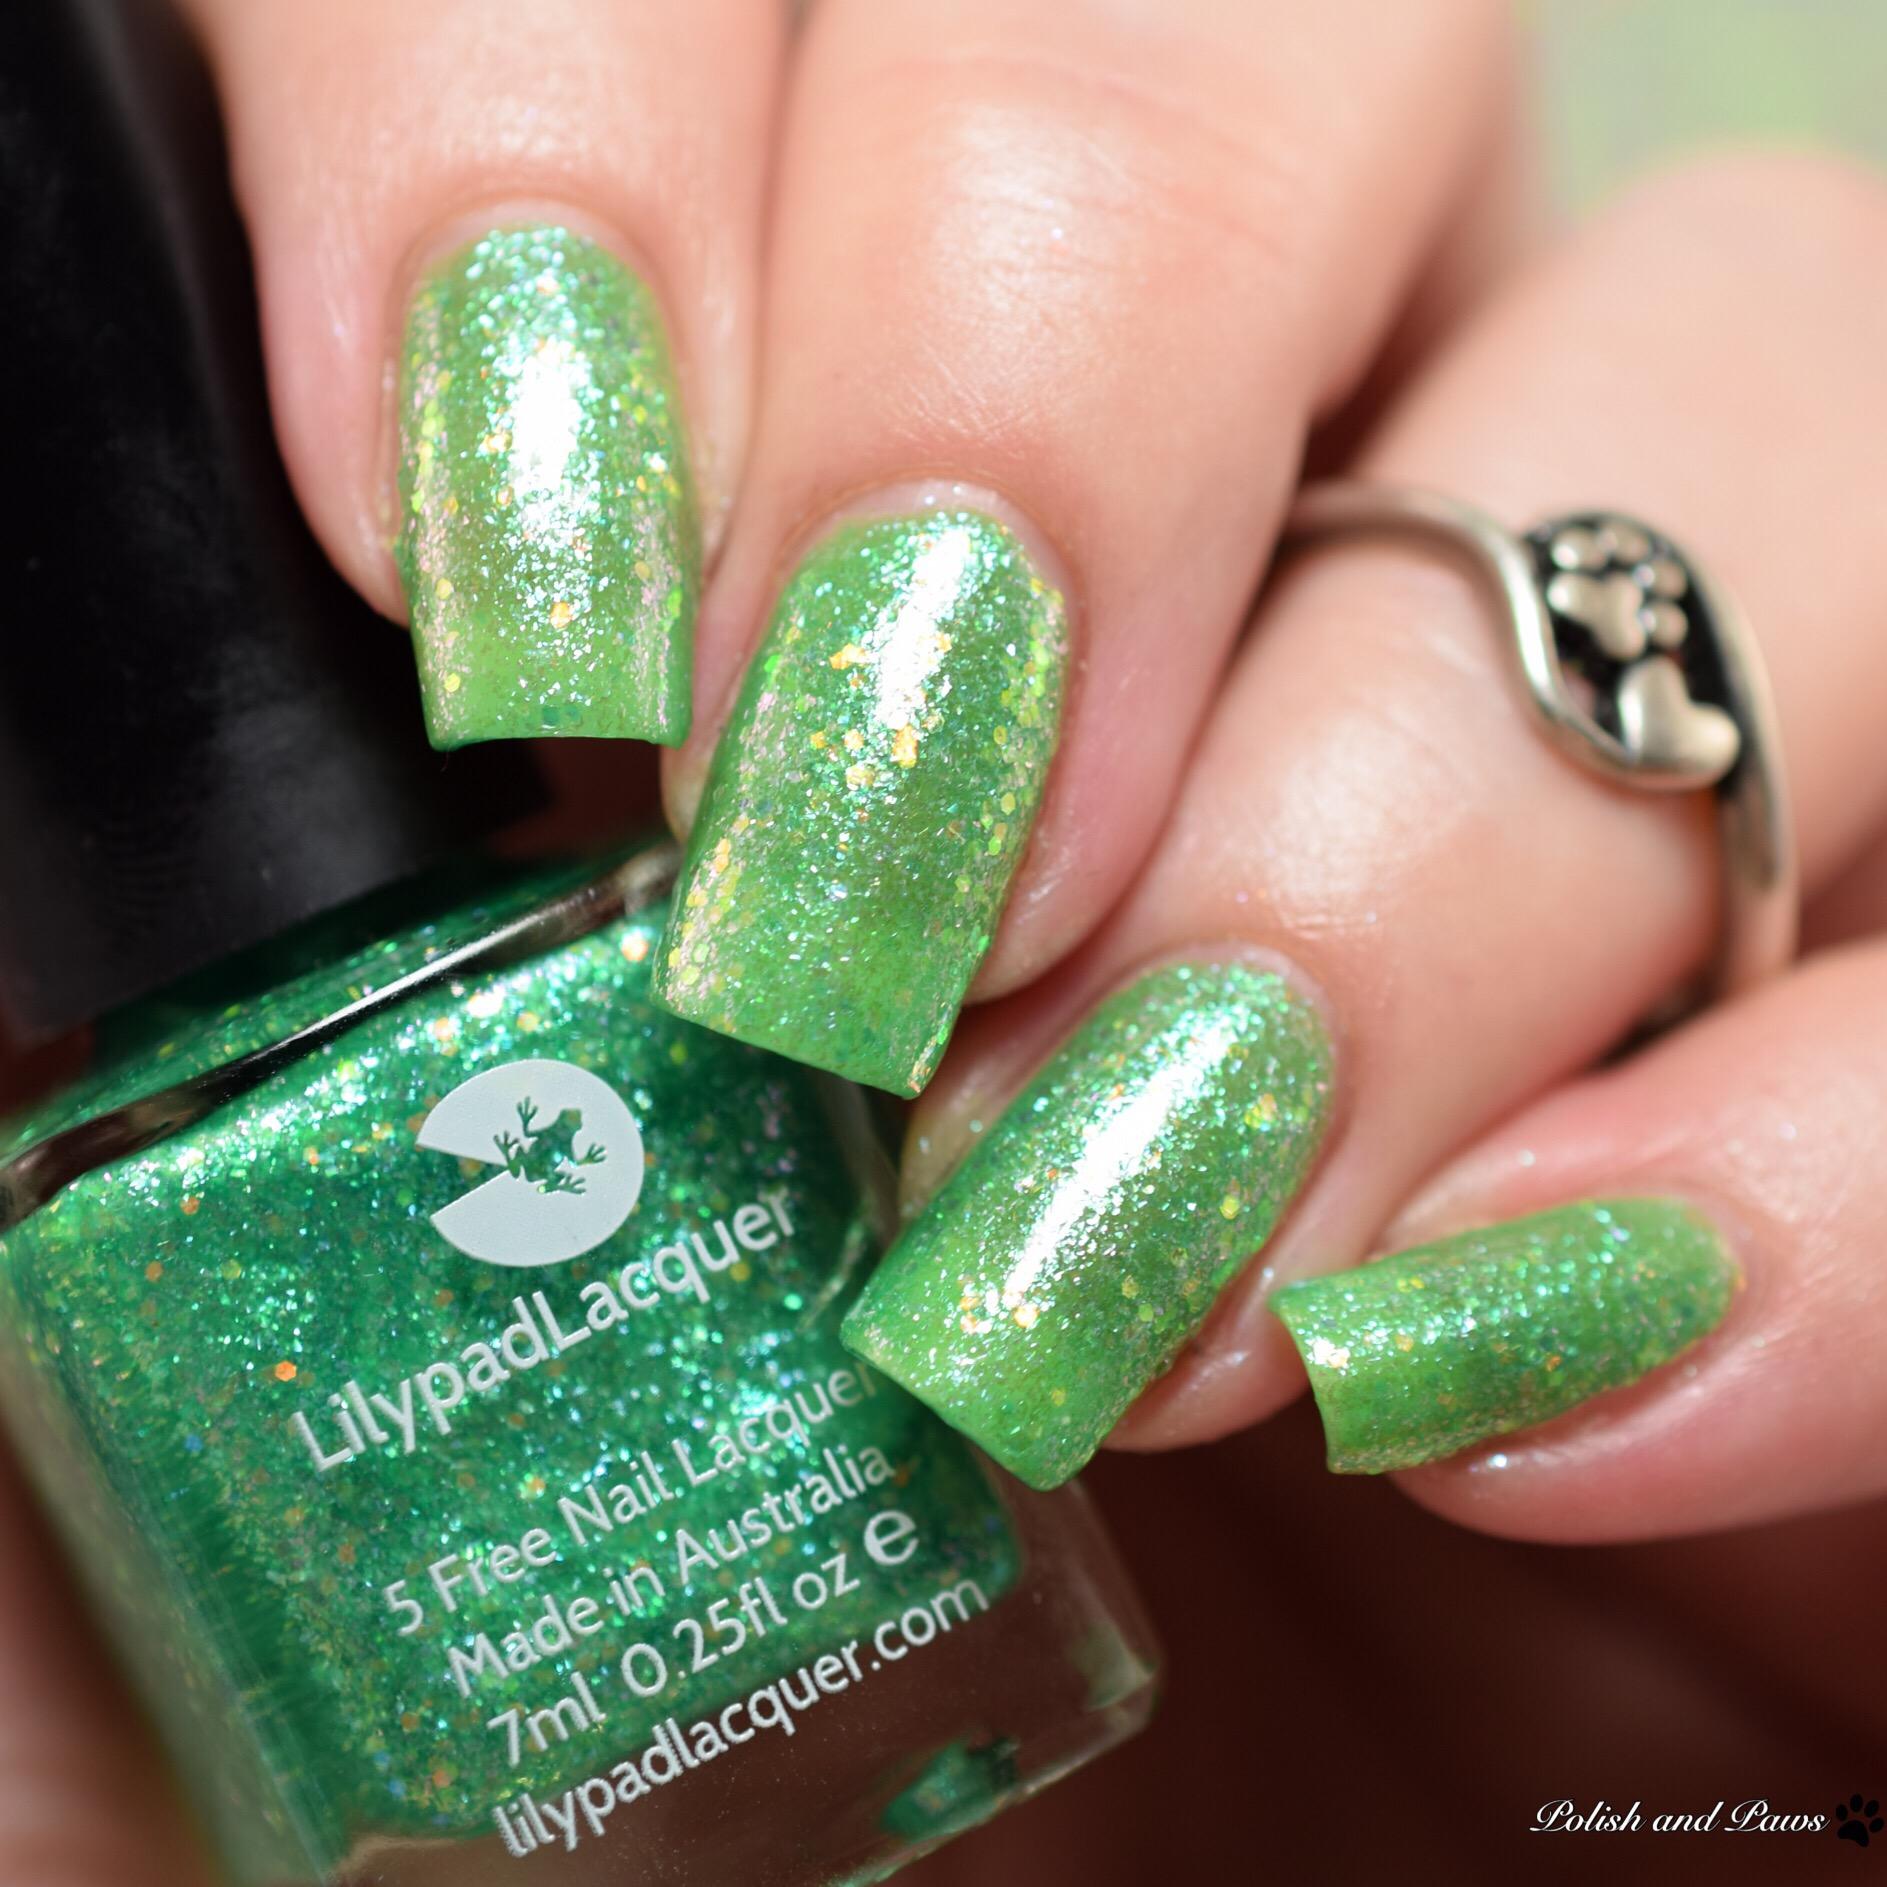 Lilypad Lacquer Kiwi Crush